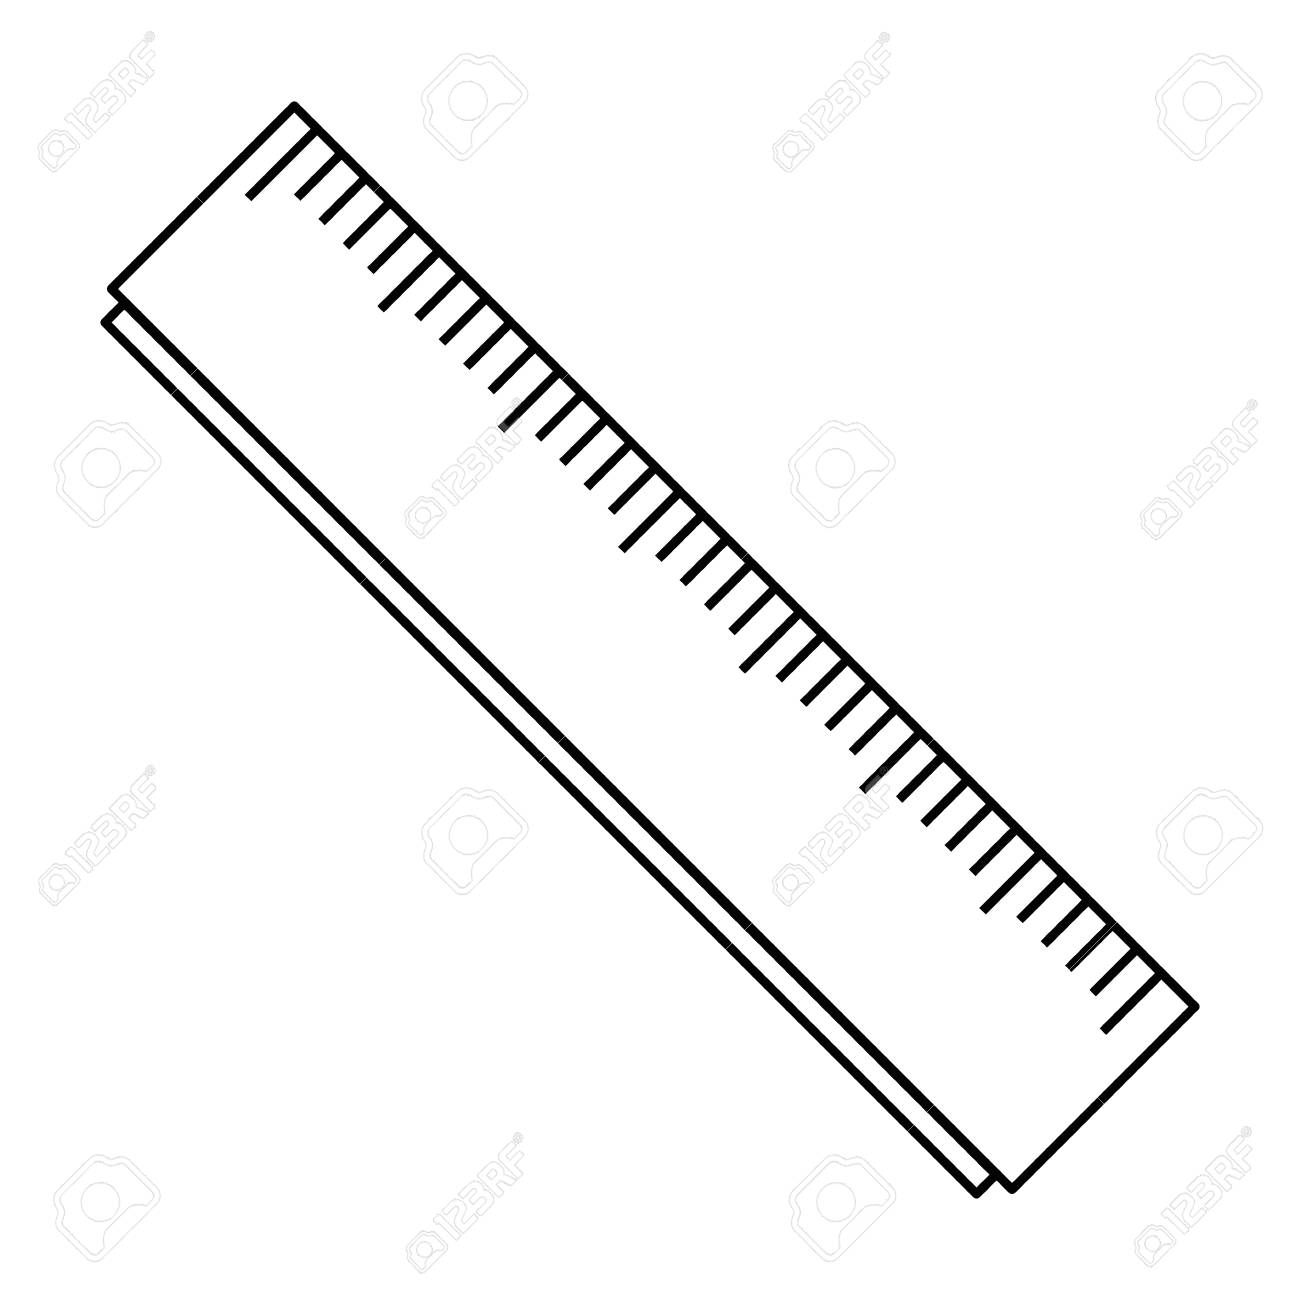 school rule isolated icon vector illustration design - 111694474